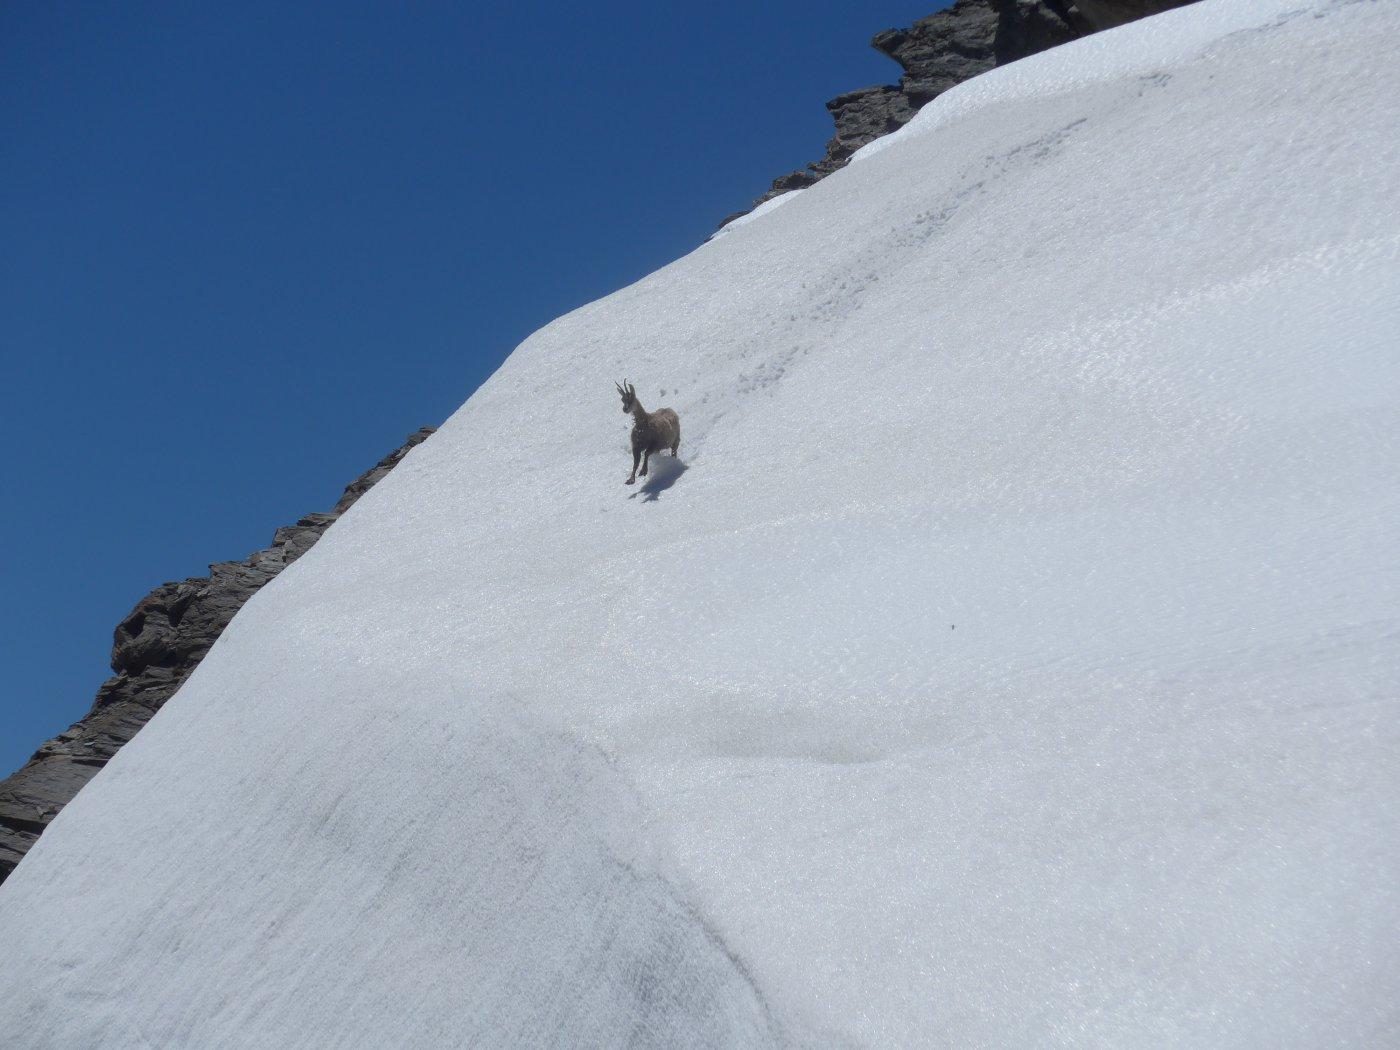 Imbocco vallone del ghiacciaio Aoiulle...lui va tranquillo!